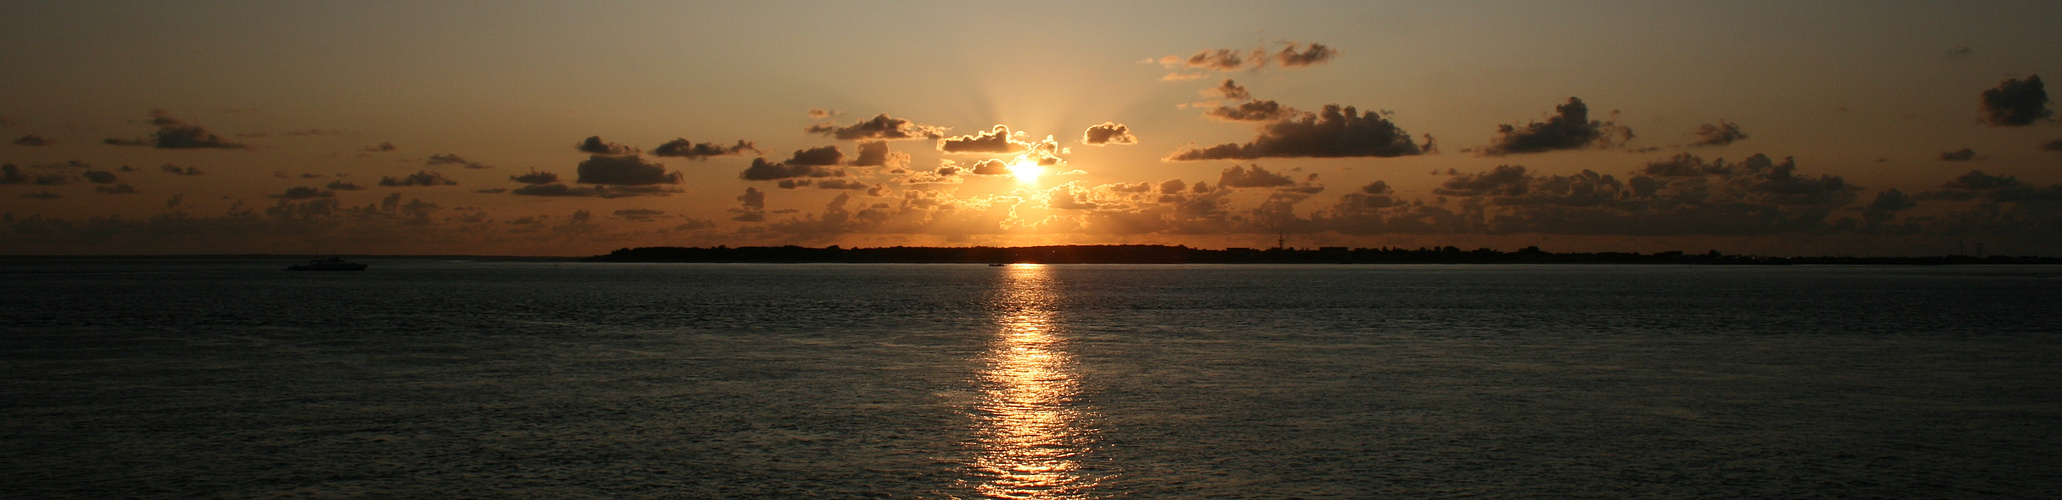 Sonnenuntergang vor der Insel Föhr 2